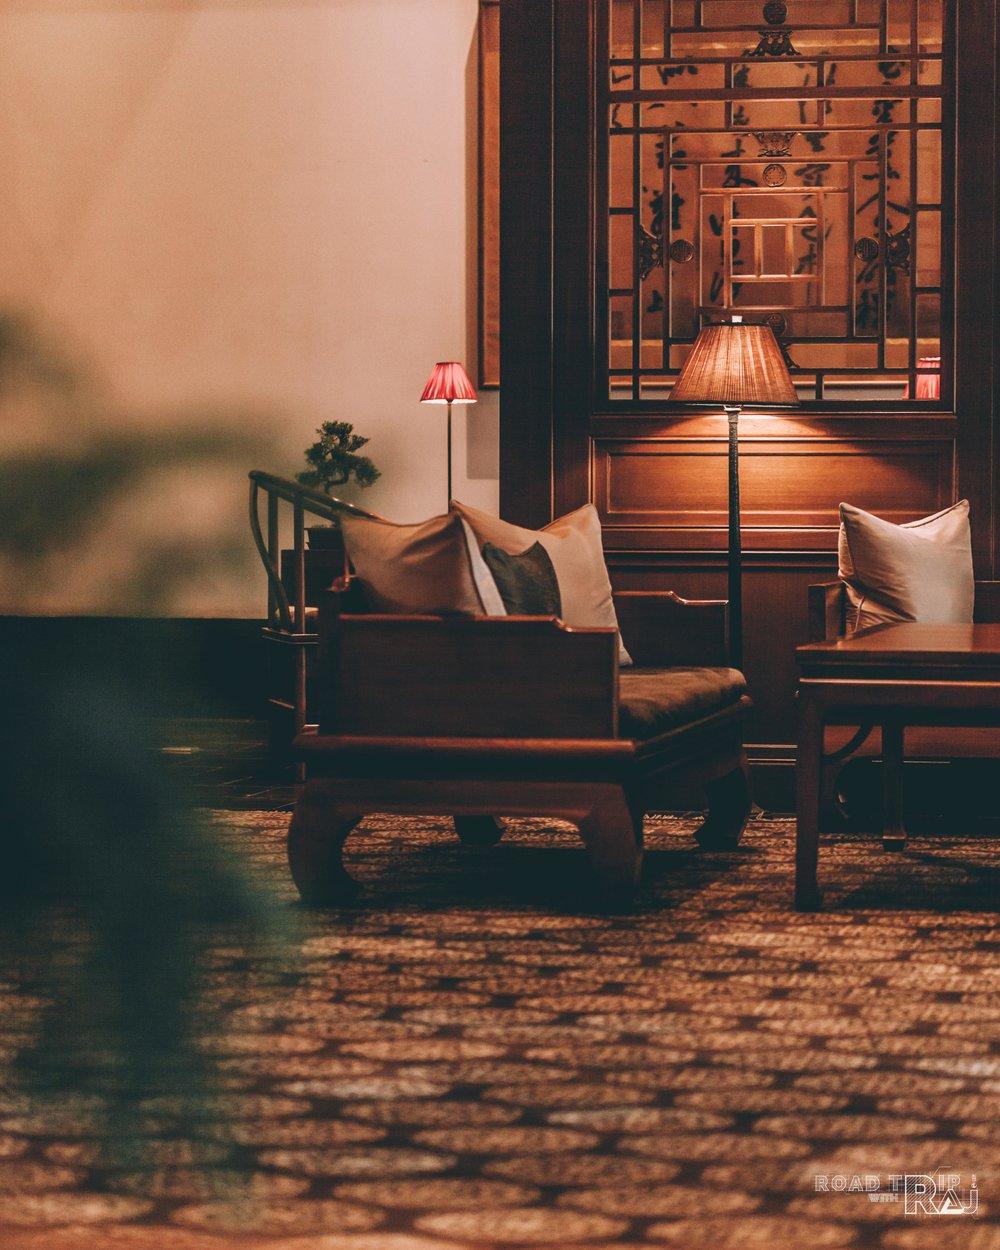 the-table-aman-summer-palace.jpg